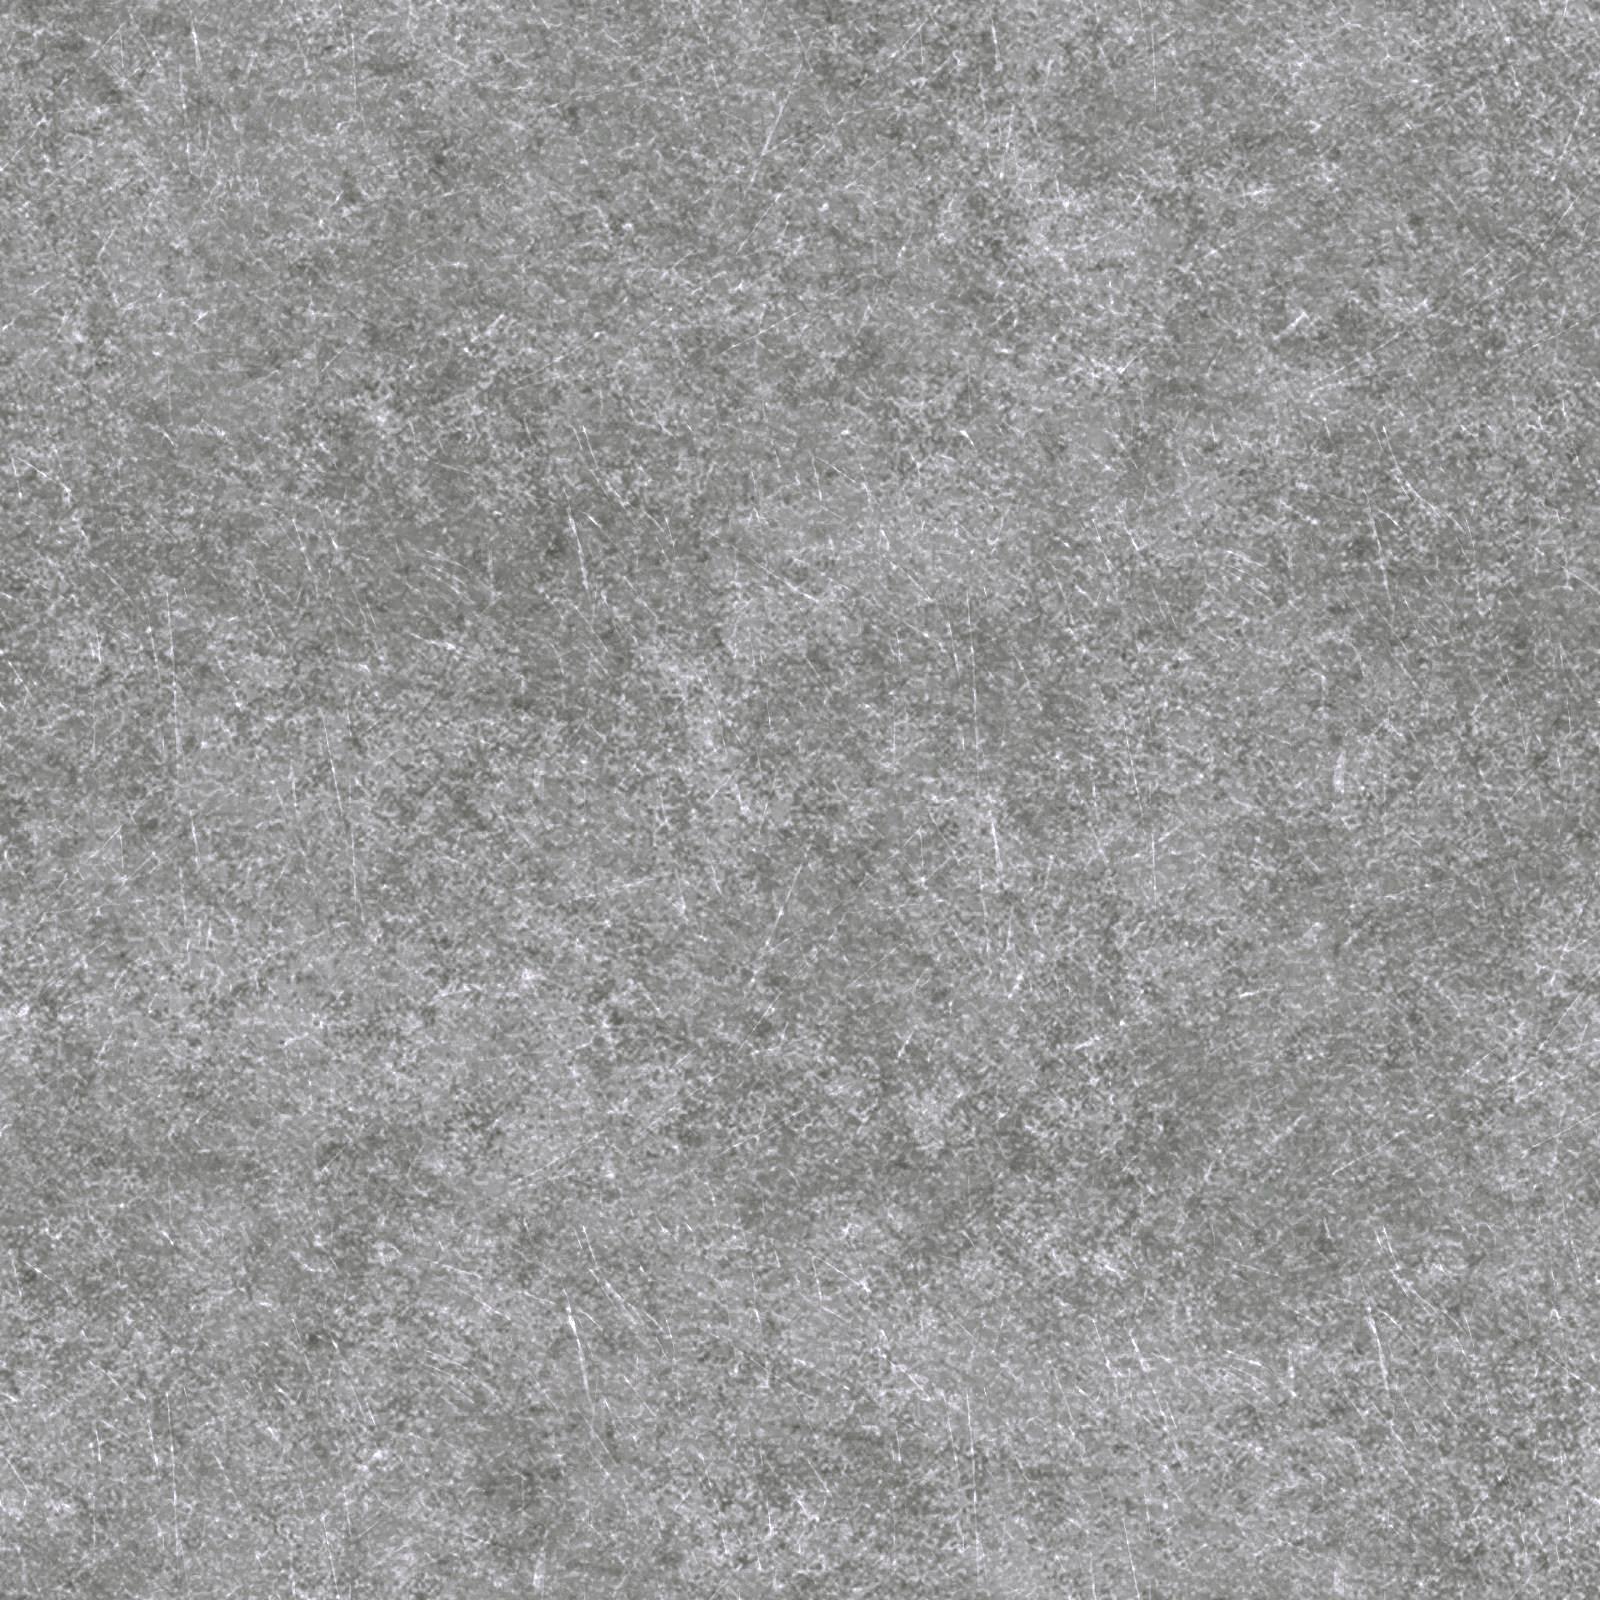 High Resolution Seamless Textures Free Metal